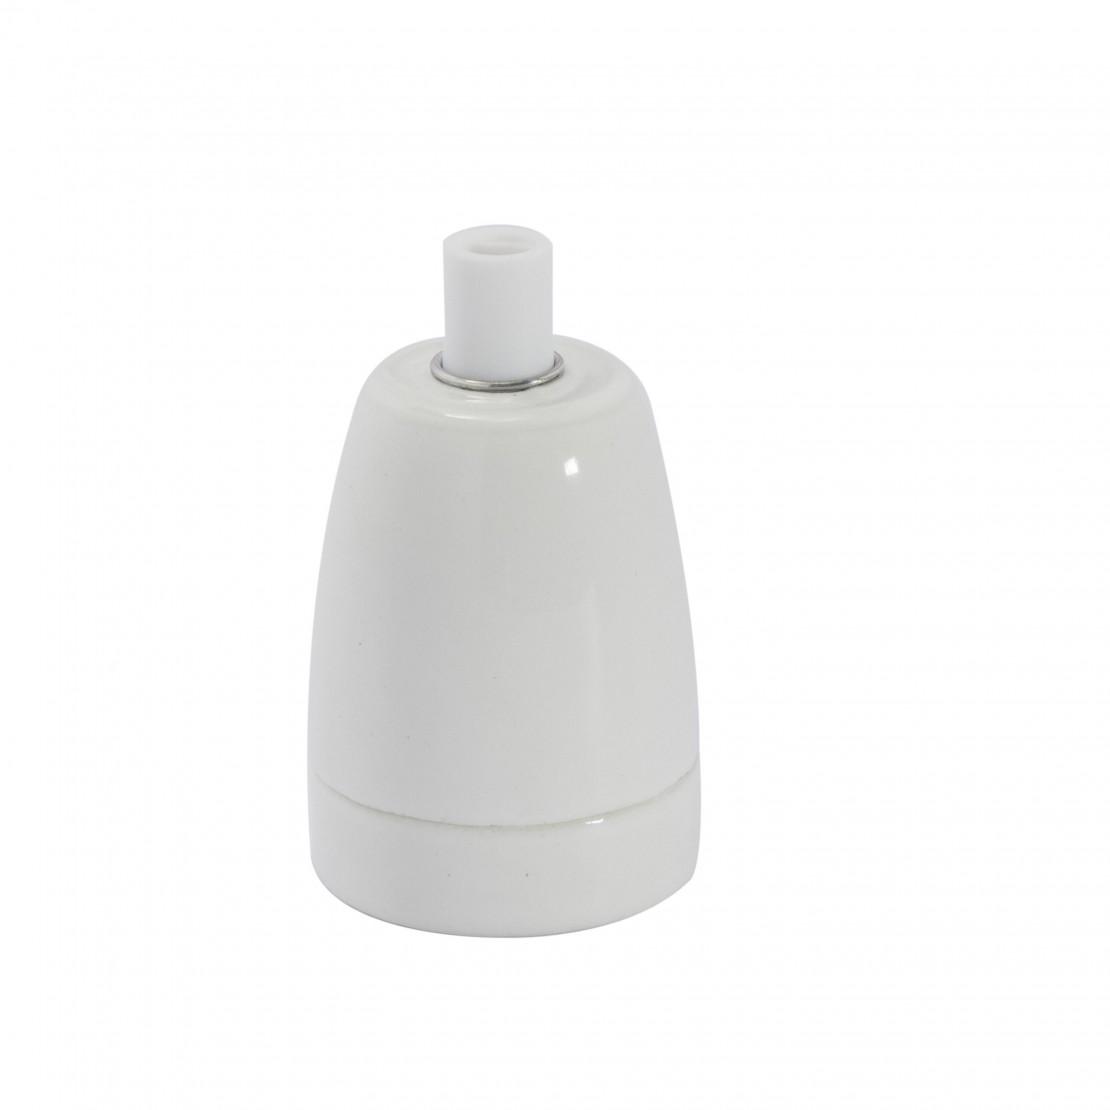 Portalamparas E27 ceramica Blanco